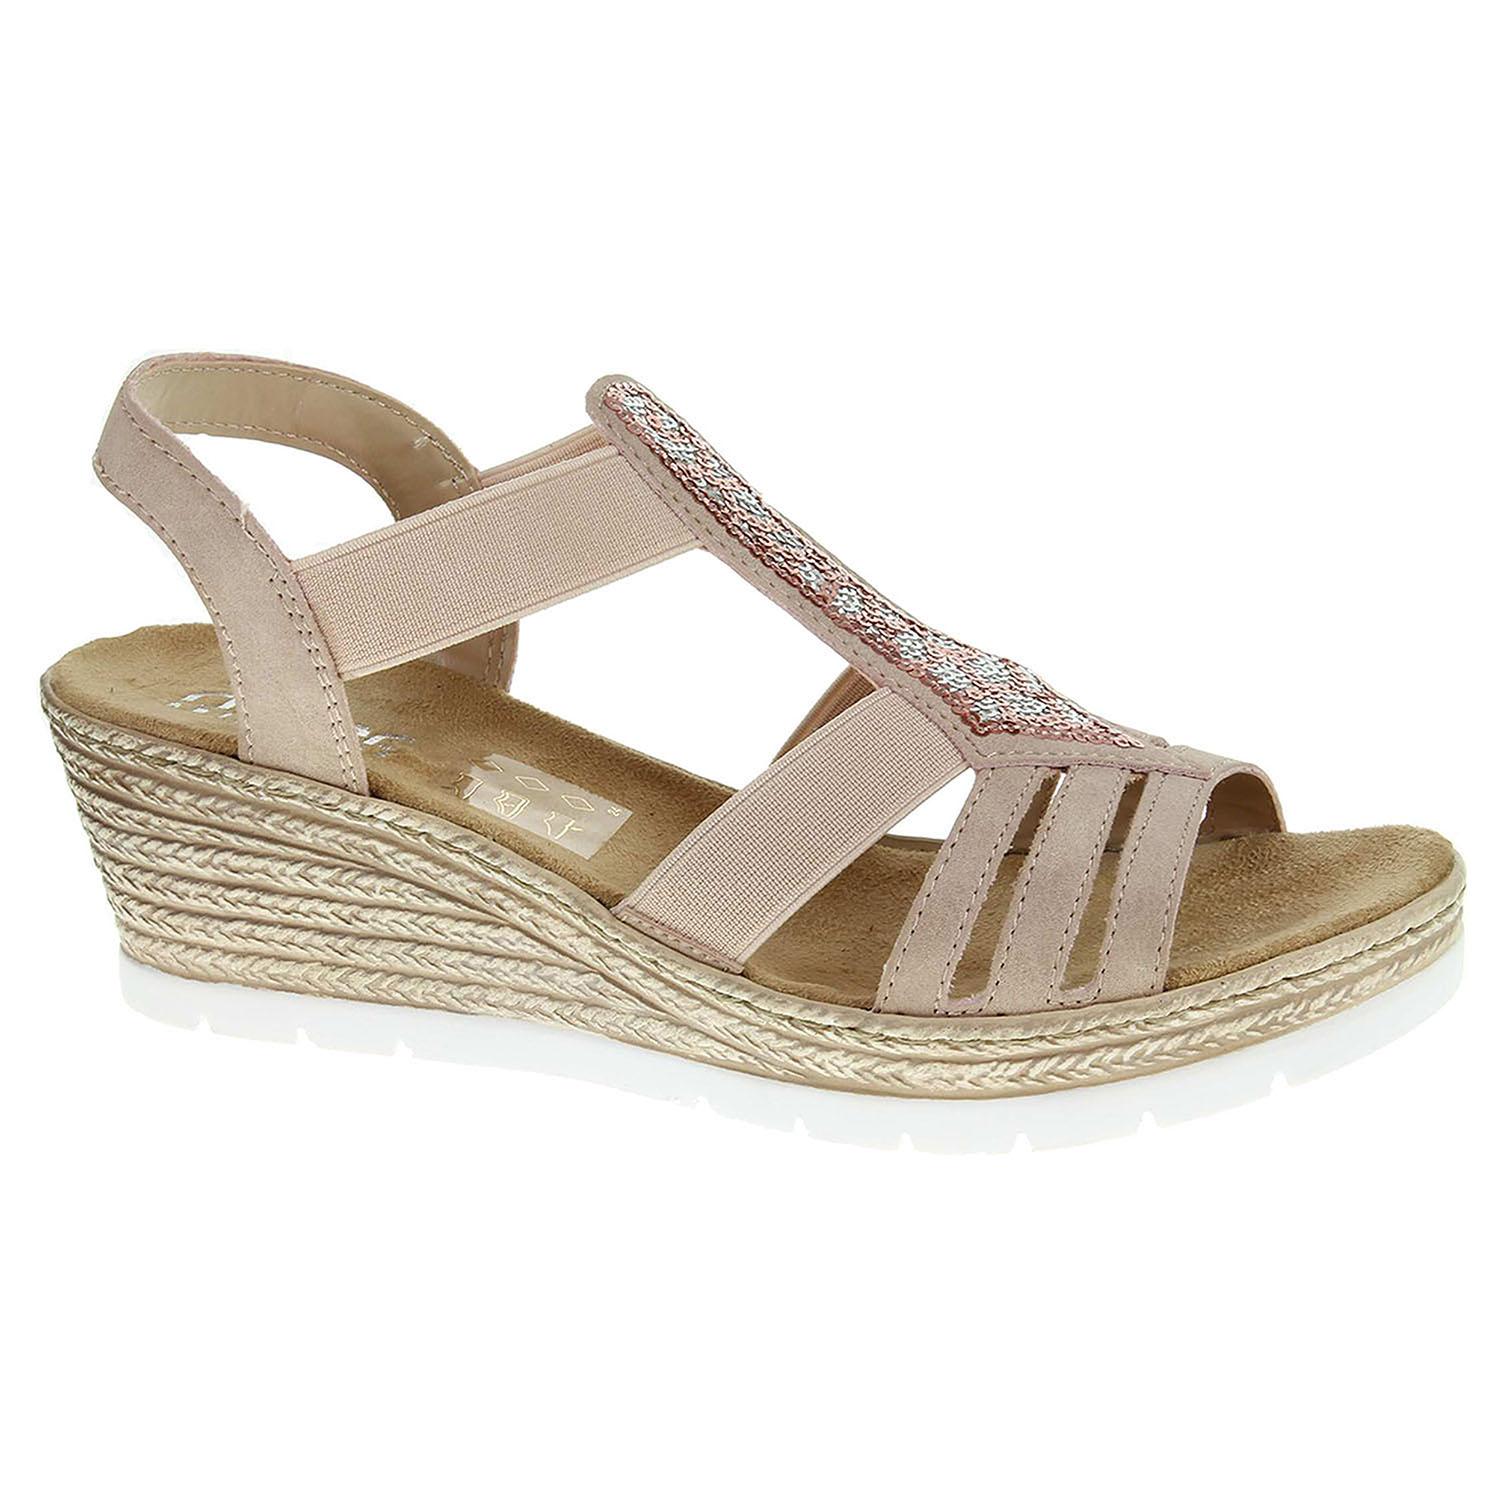 089de0b53d868 Dámské sandály Rieker 61913-31 rosa | Rejnok obuv